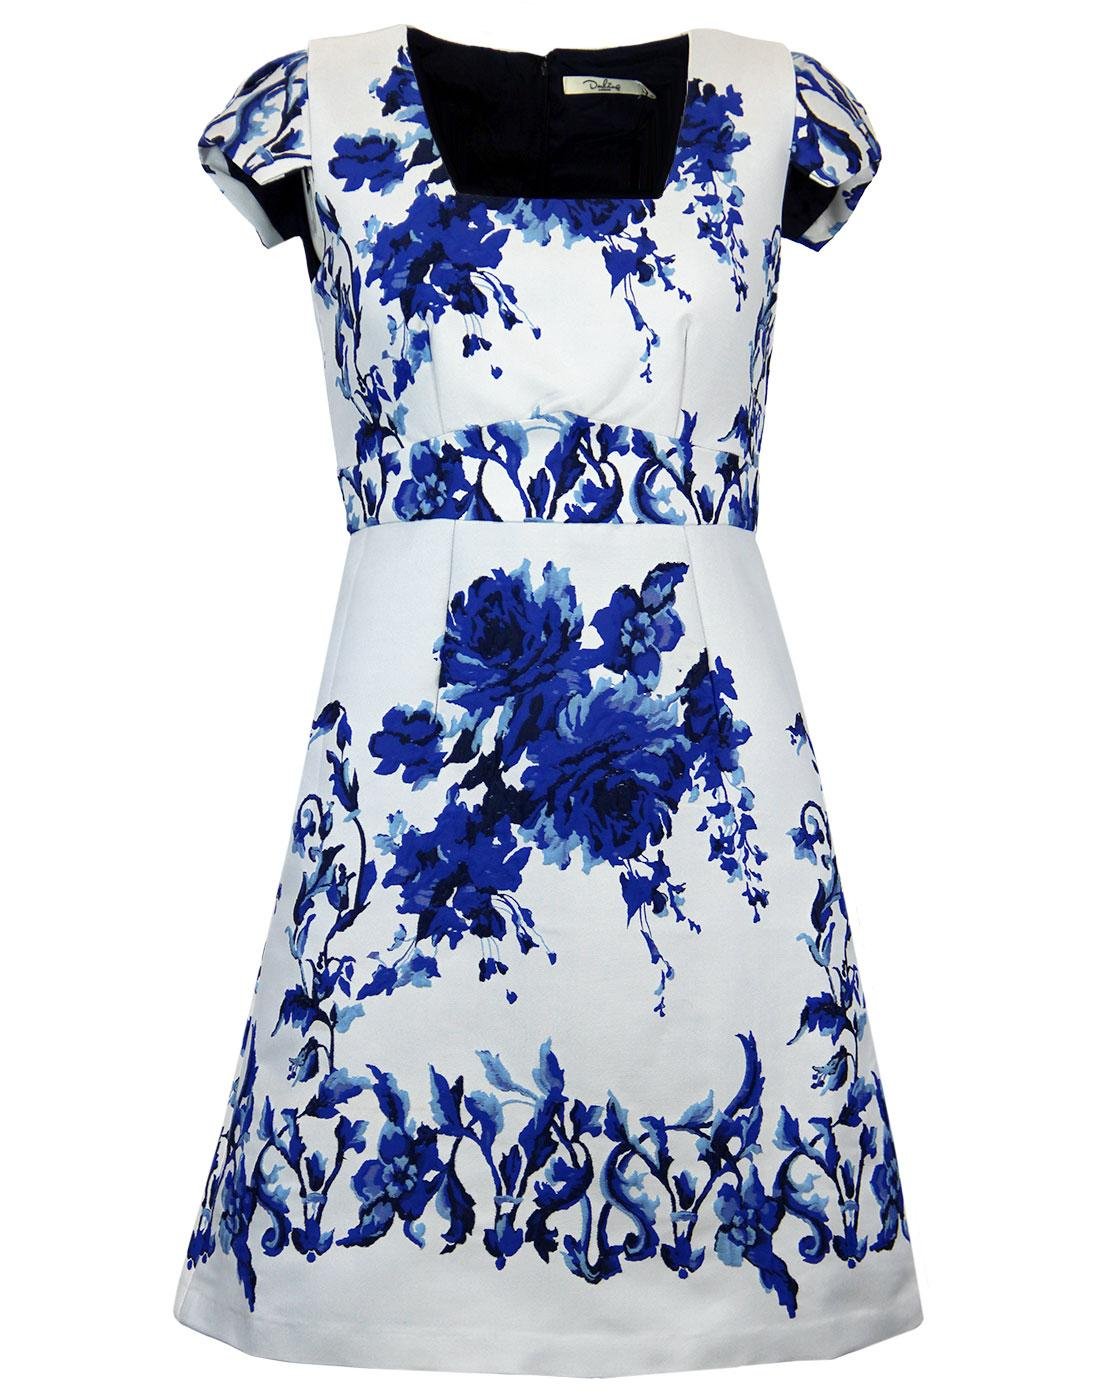 Valentena DARLING Retro 60s Embroidered Dress